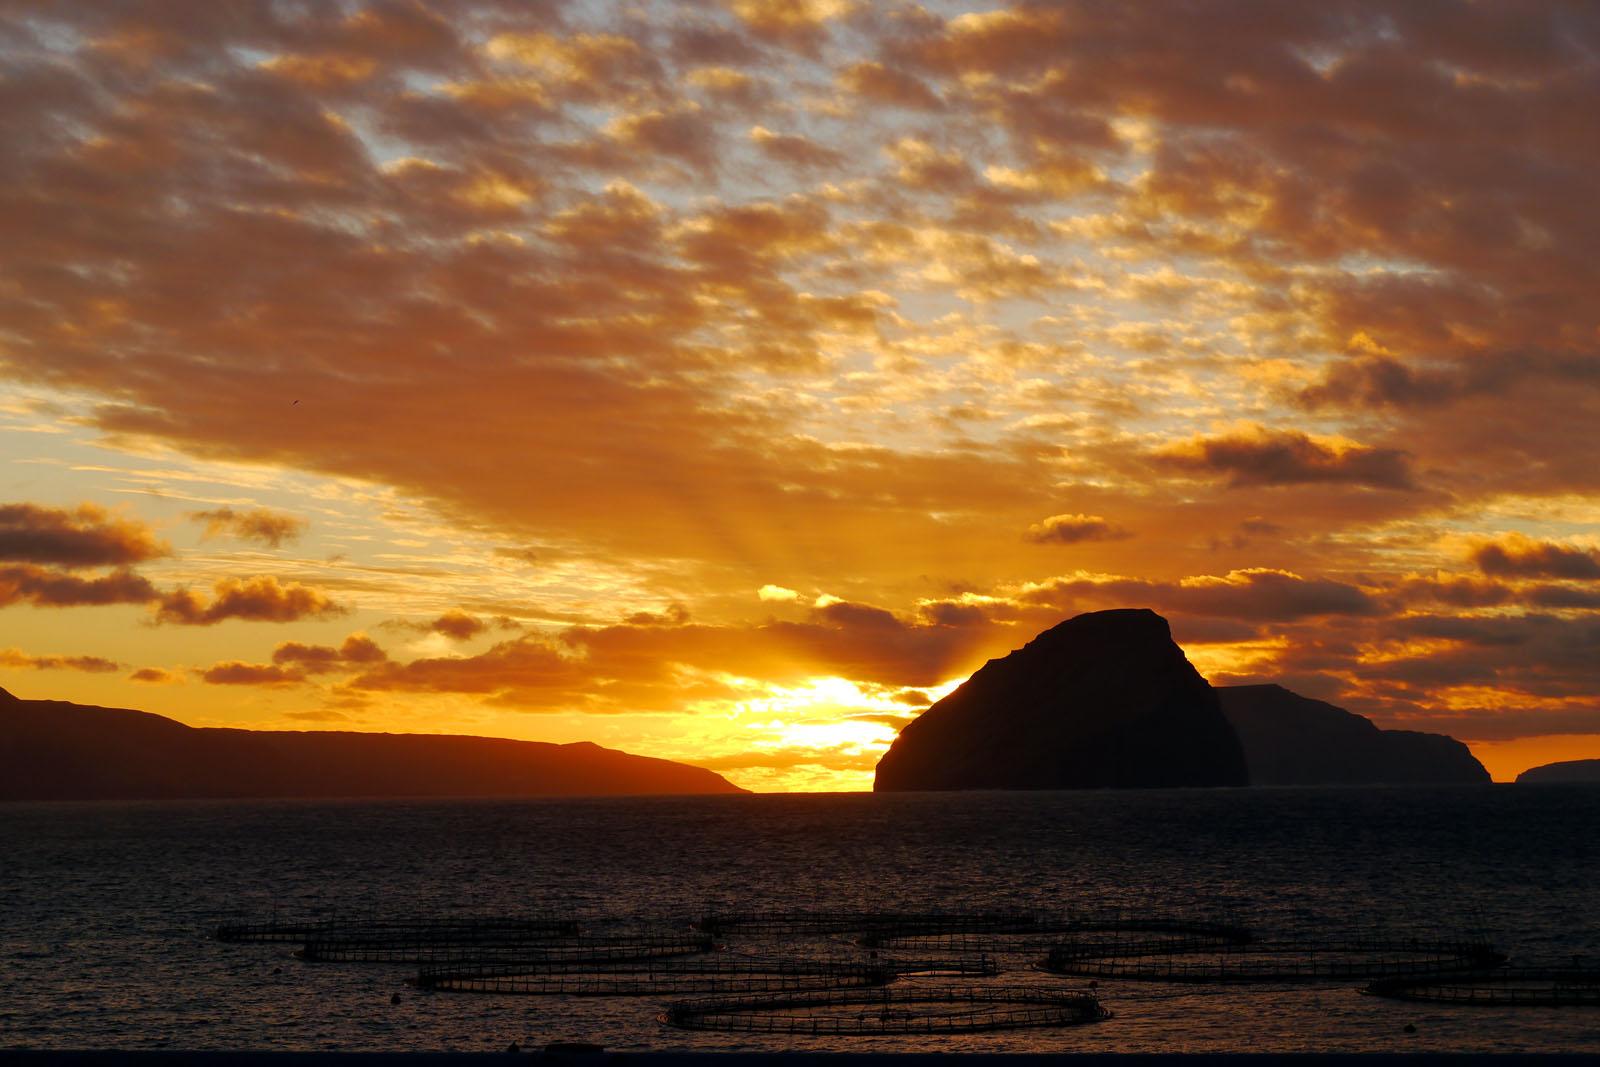 Sandavagur-Vagar-Sonnenaufgang-Meer-Koltur-Faroer Inseln-2